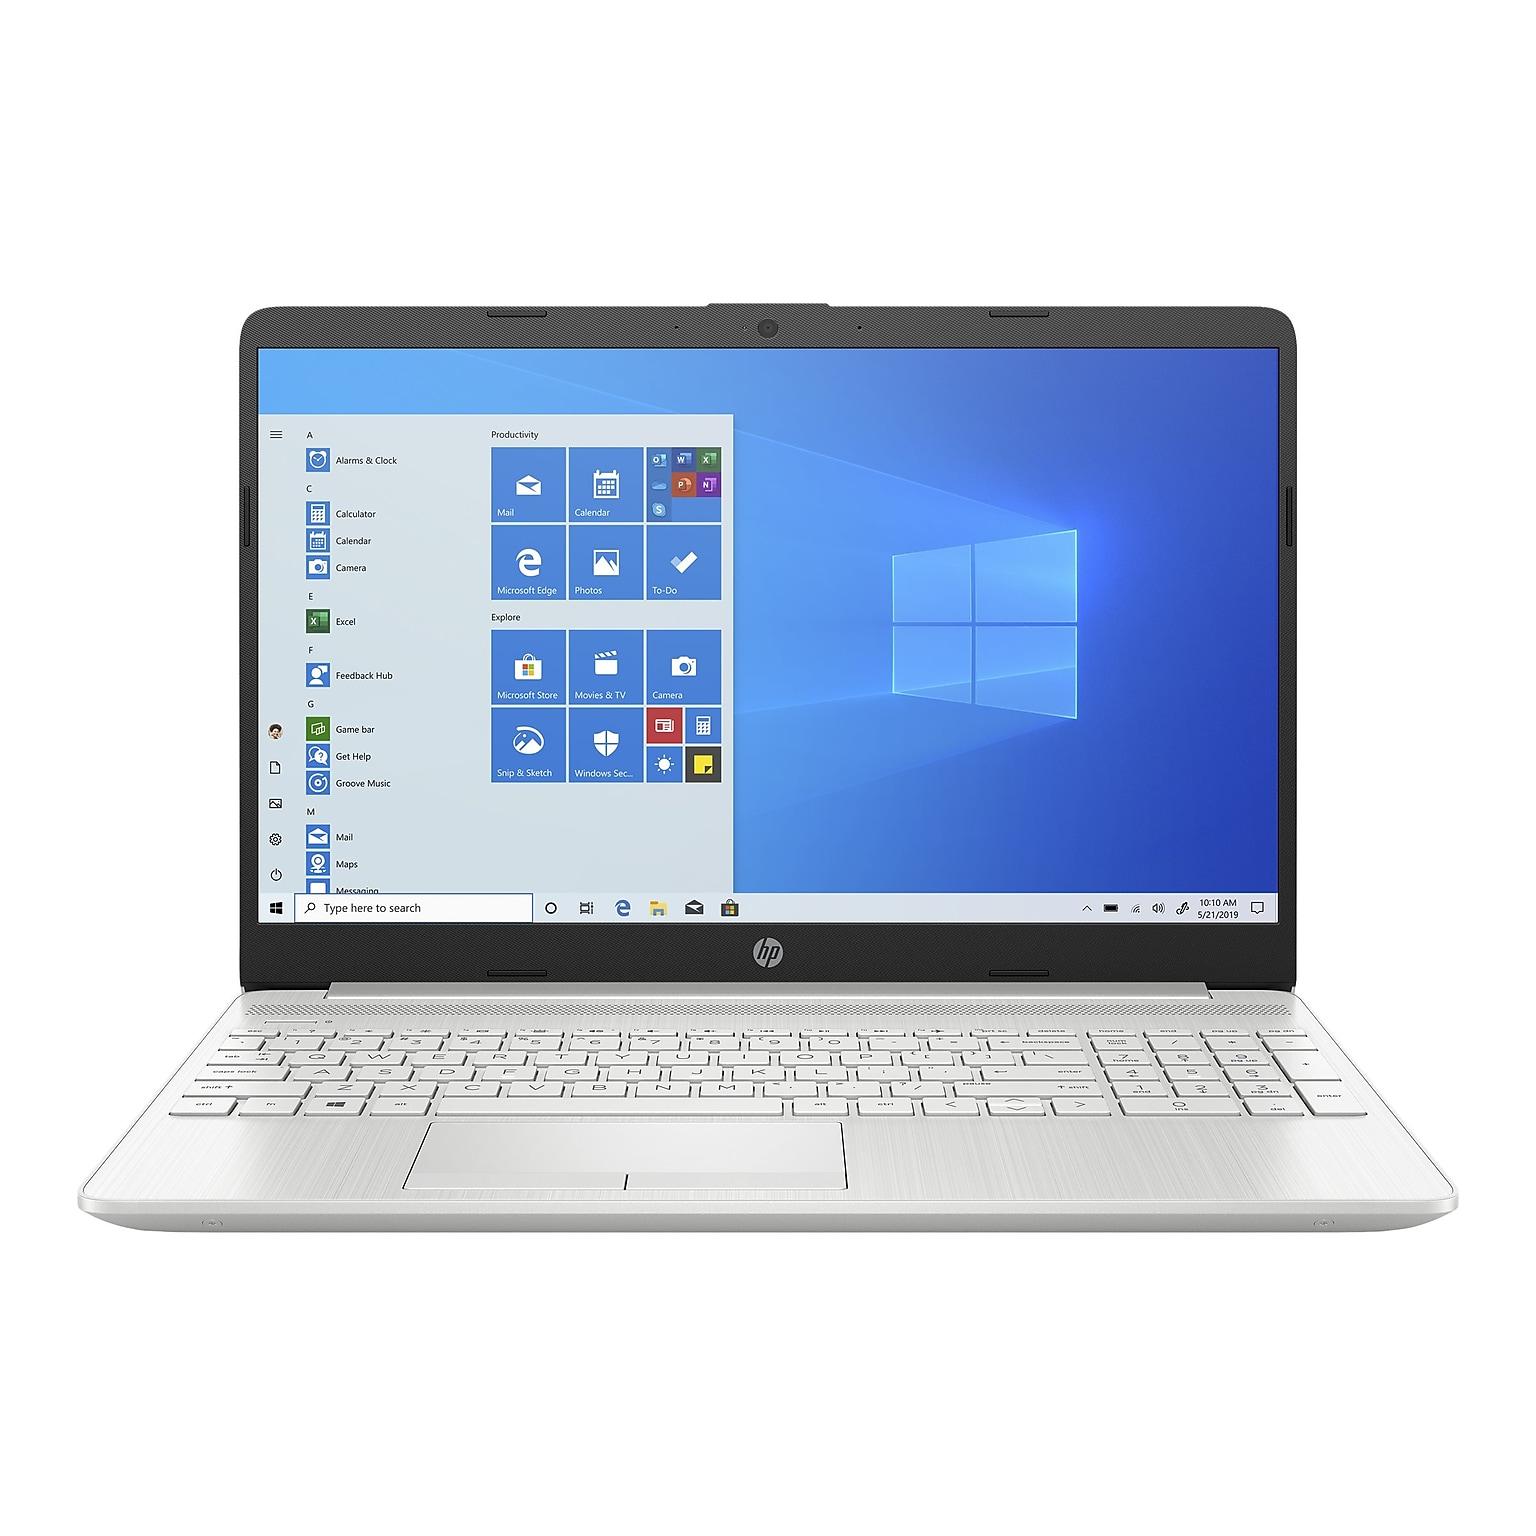 "HP 15.6"" FHD Laptop (Quad i5-1135G7 / 8GB RAM / 256GB SSD)"